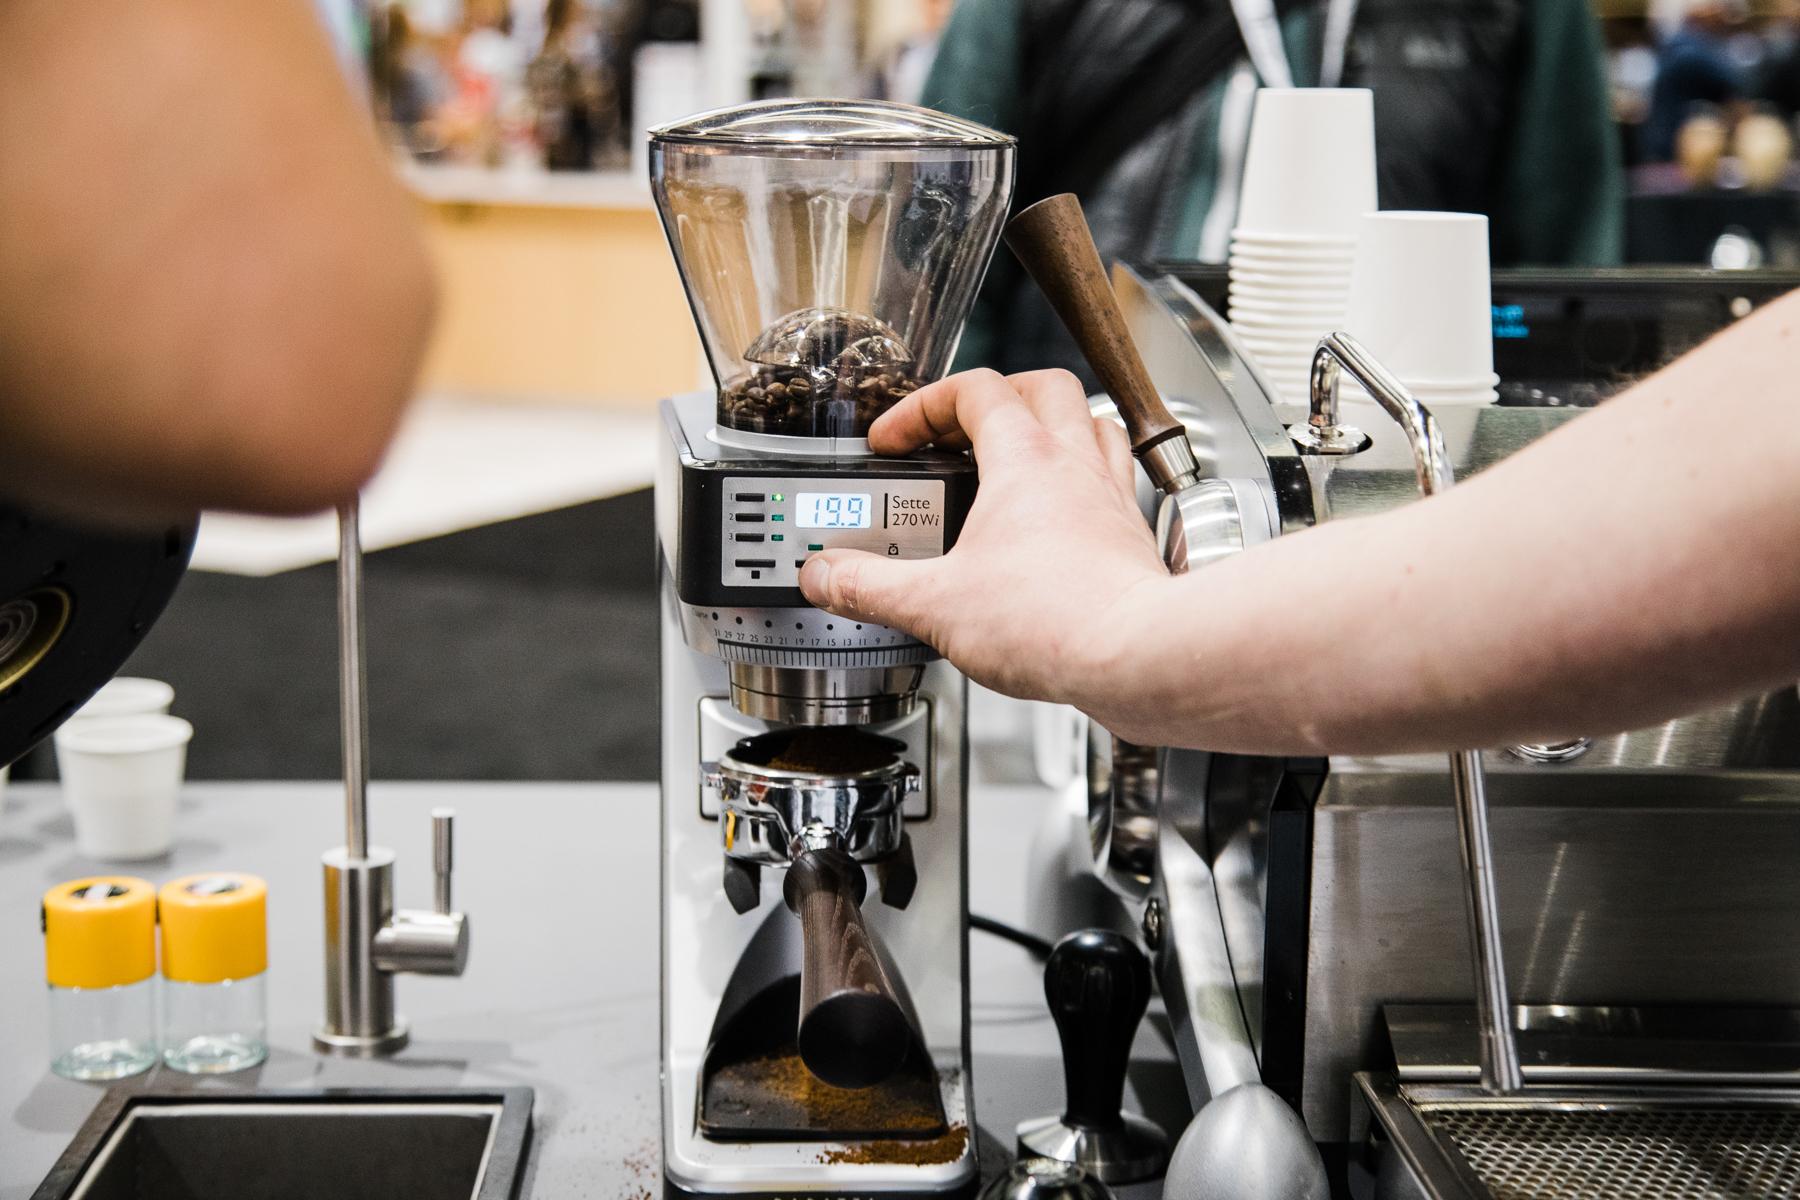 A Baratza Sette 270 W i being showcased beside a Slayer Espresso Machine at the 2018 Coffee Expo.